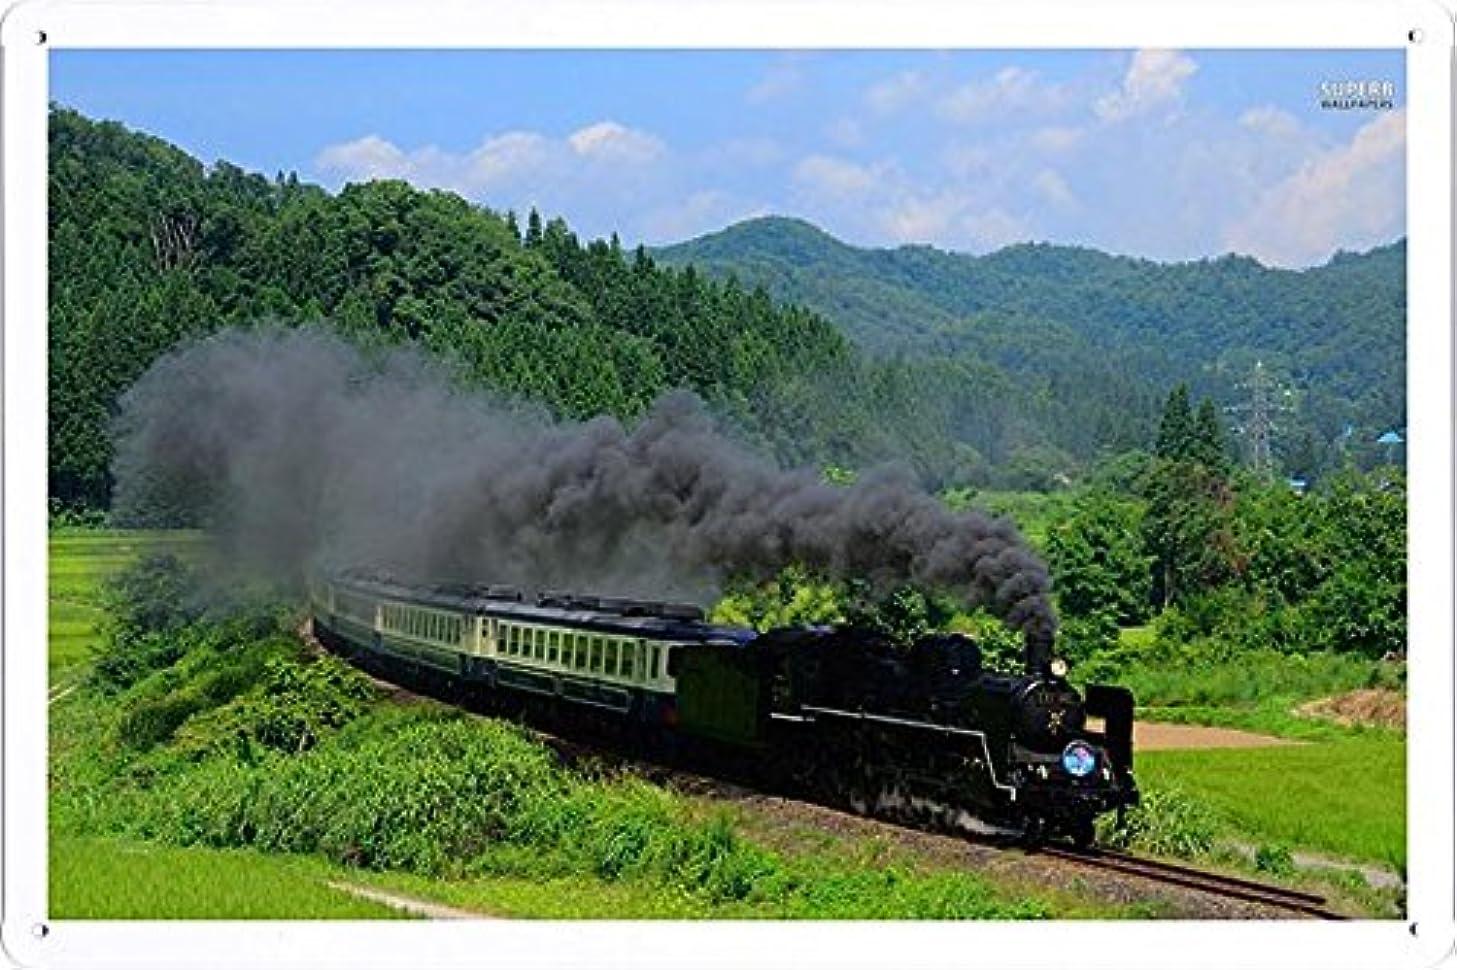 Steam Locomotive 23695 Tin Poster by Food & Beverage Decor Sign